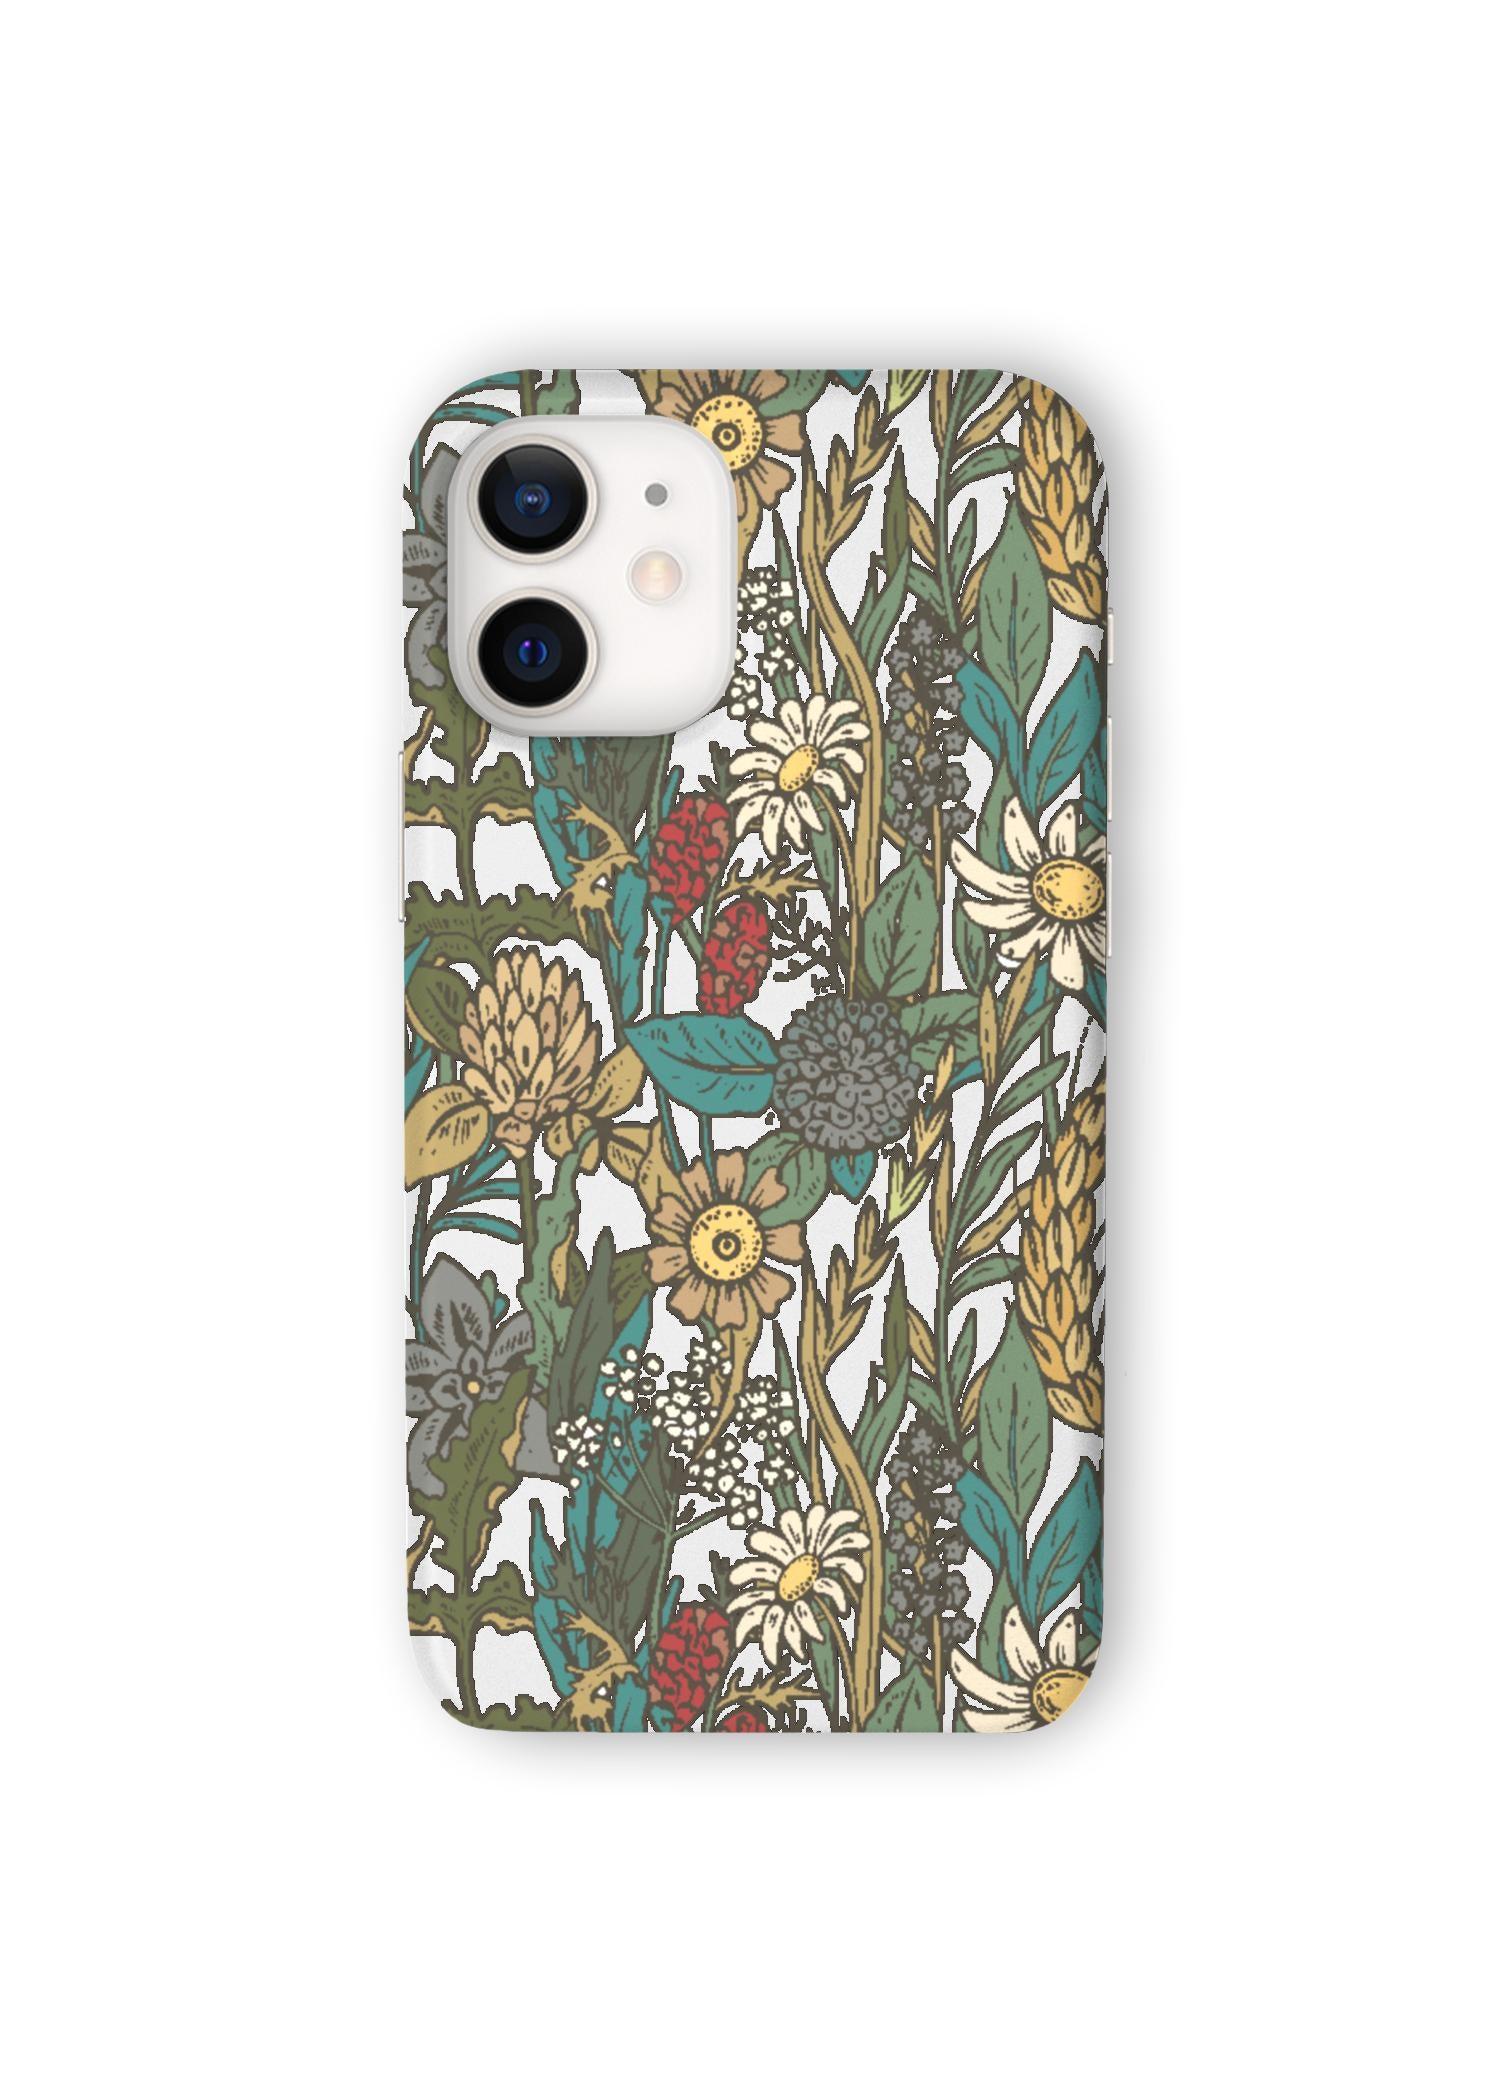 VIDA iPhone Case - Wild Flower Garden by VIDA Original Artist  - Size: iPhone 12 Mini / Ultraslim